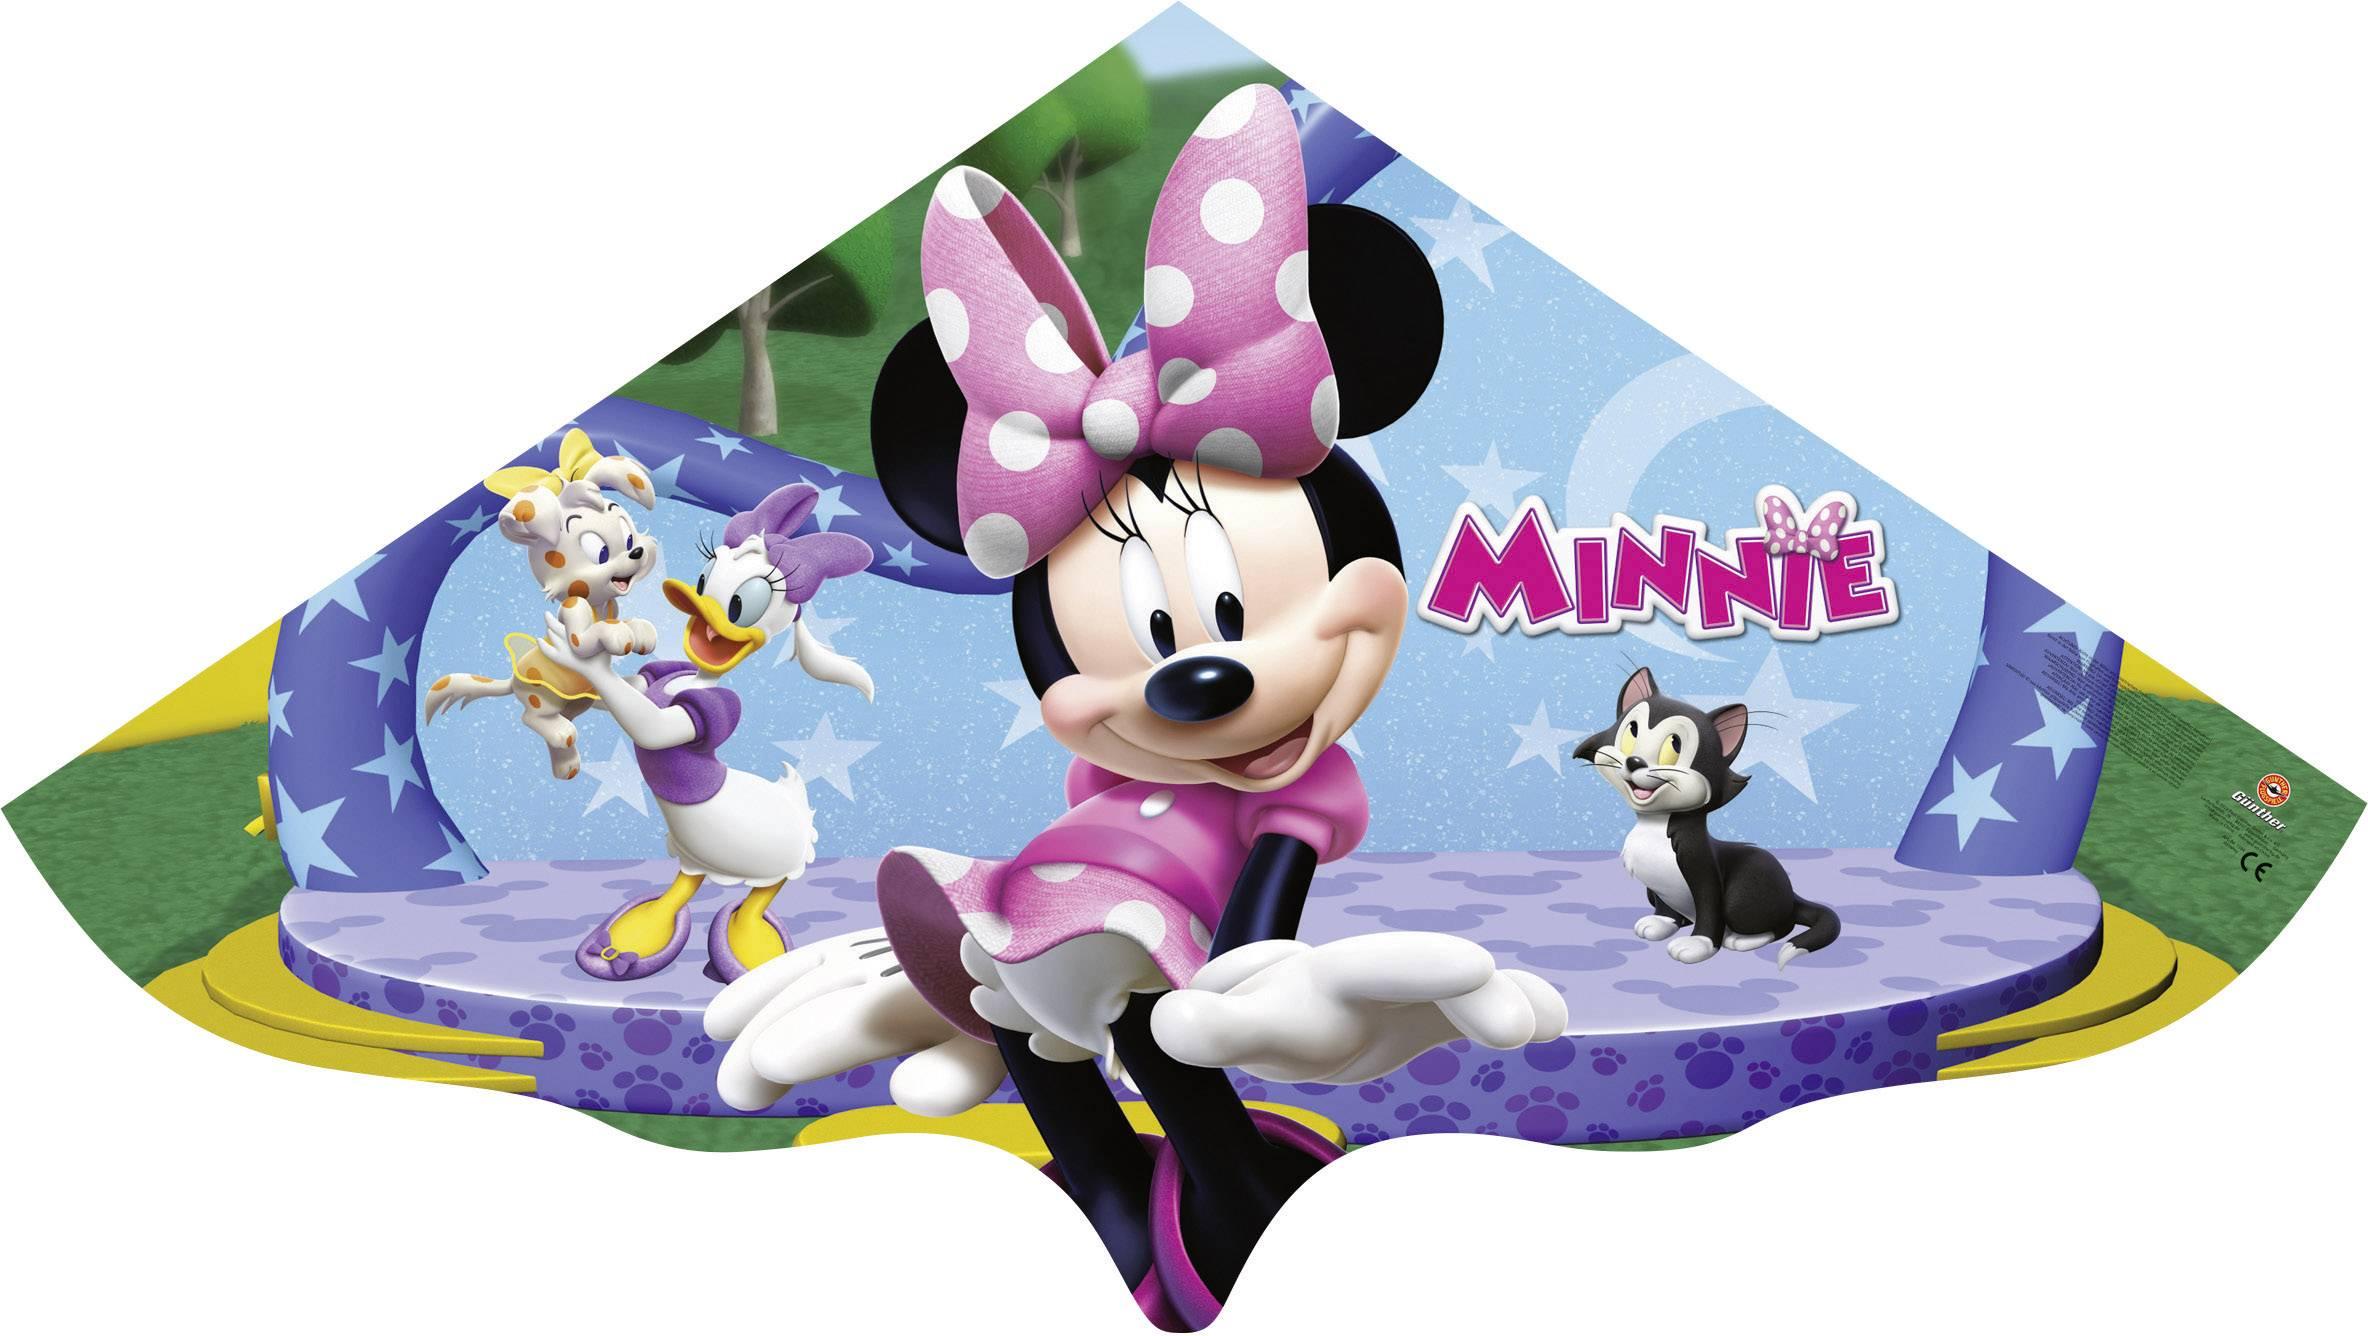 Šarkan pre deti Günther Minnie mouse 1184, 1150 mm